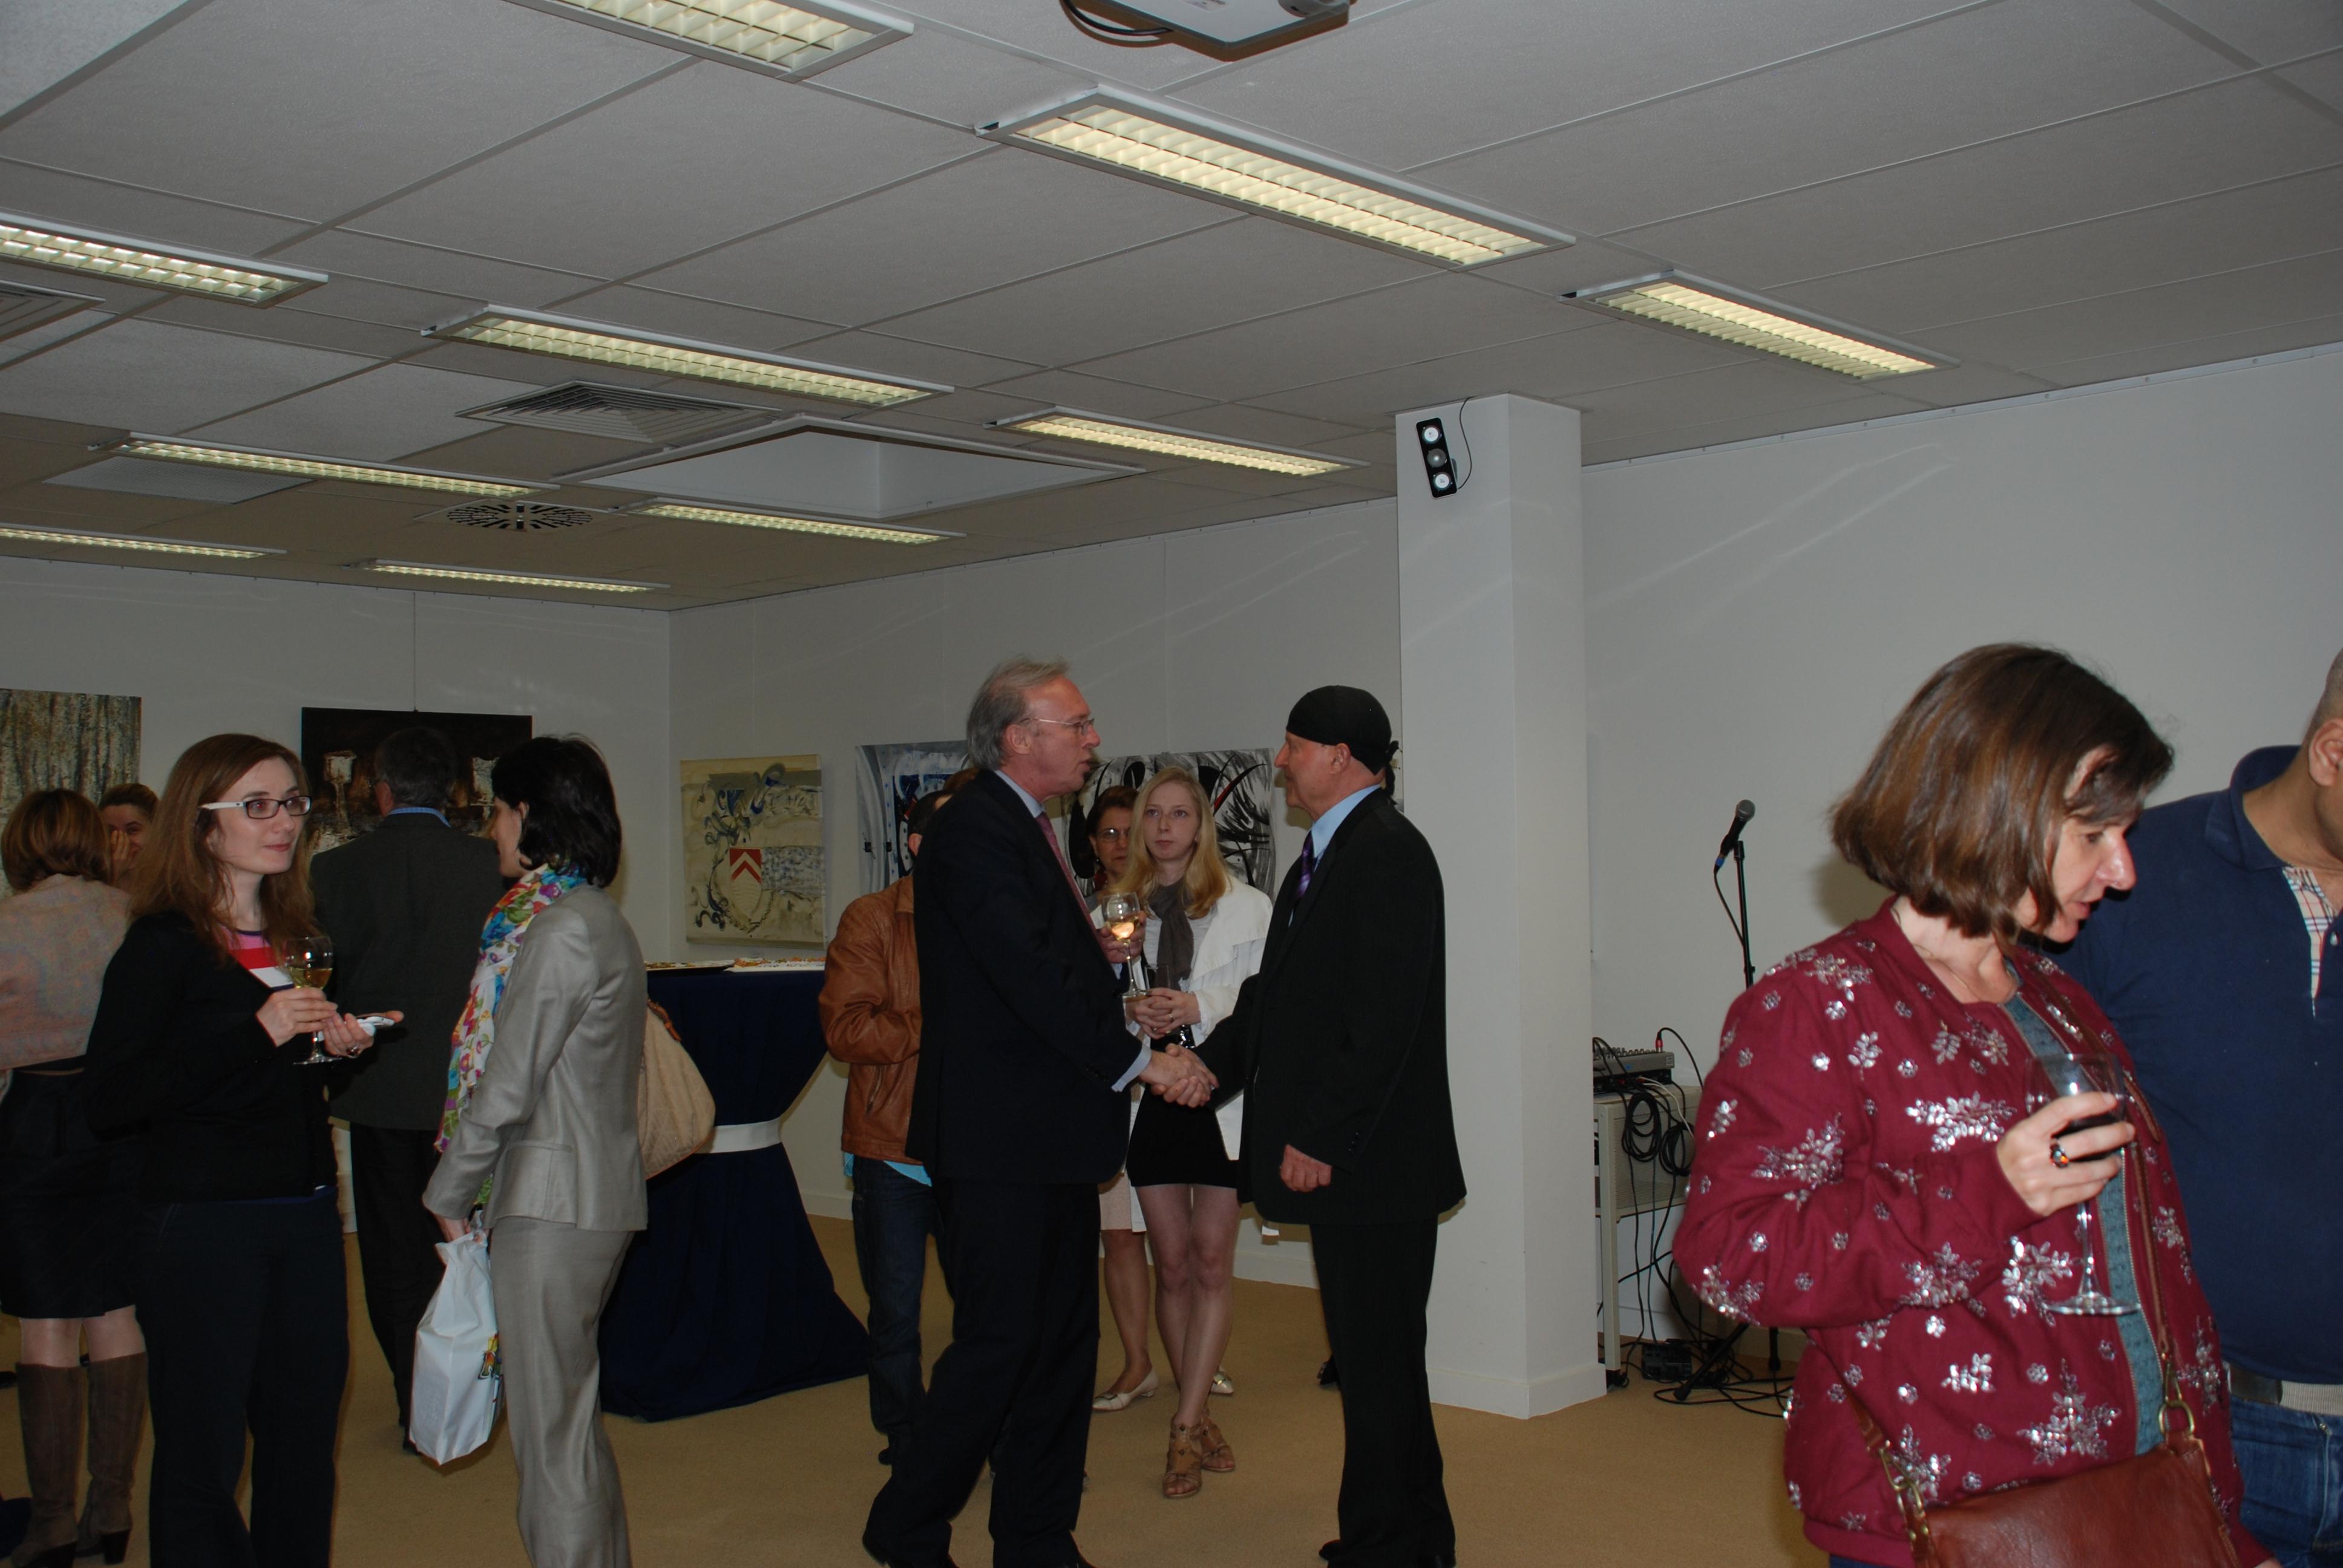 DSC_2347 - 10 mars 2014 - Oeuvres de Cosmin Fruntes, Lisandru Neamtu et Vasili Diviza